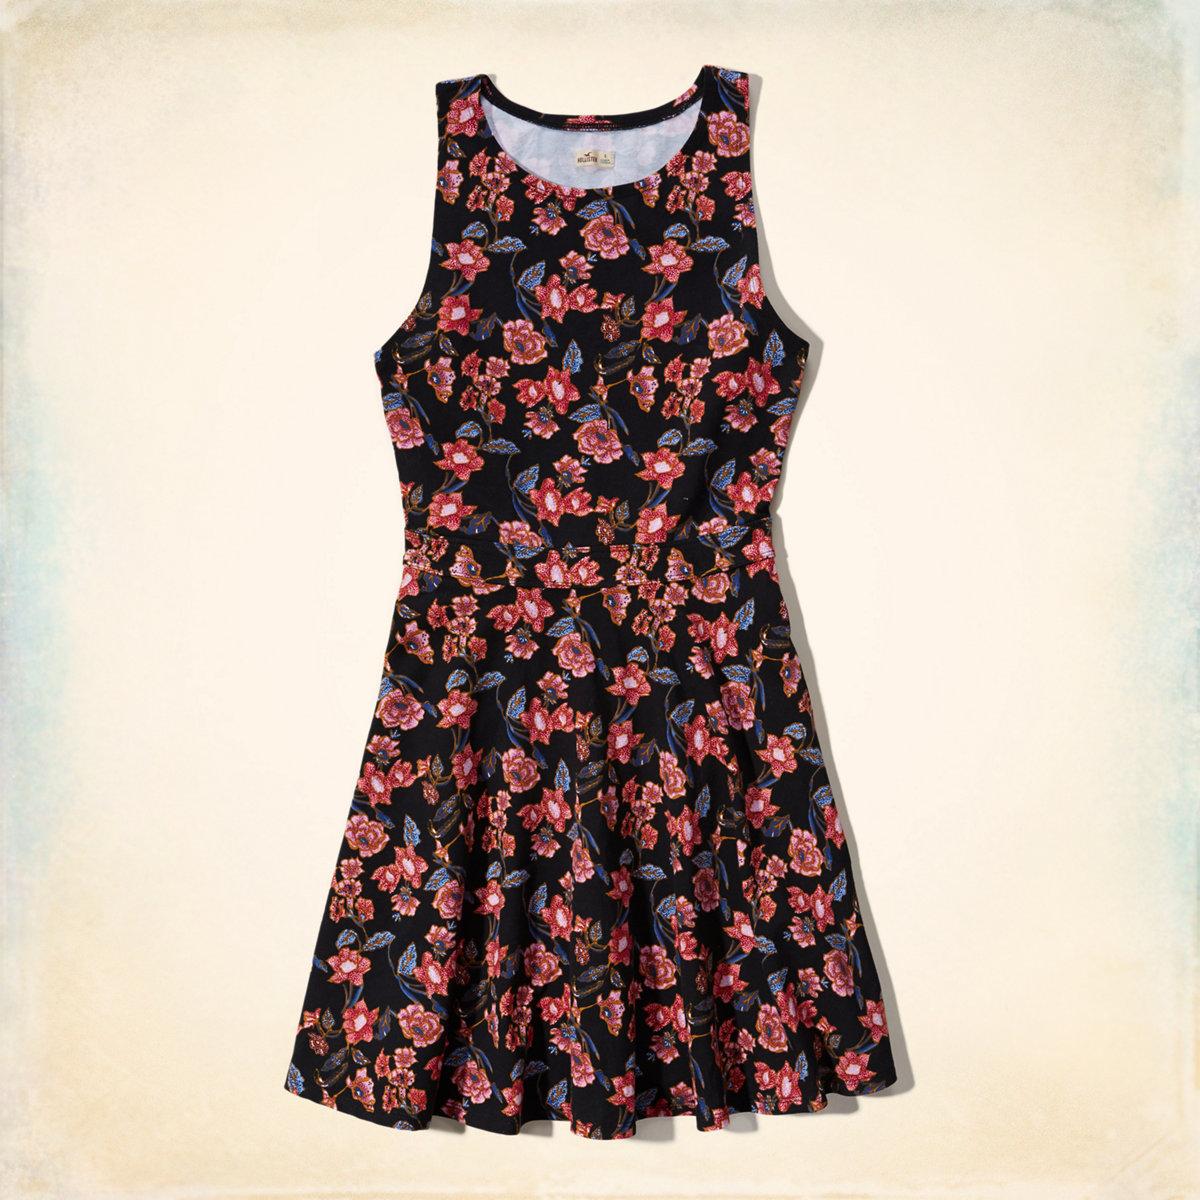 Knit Skater Dress